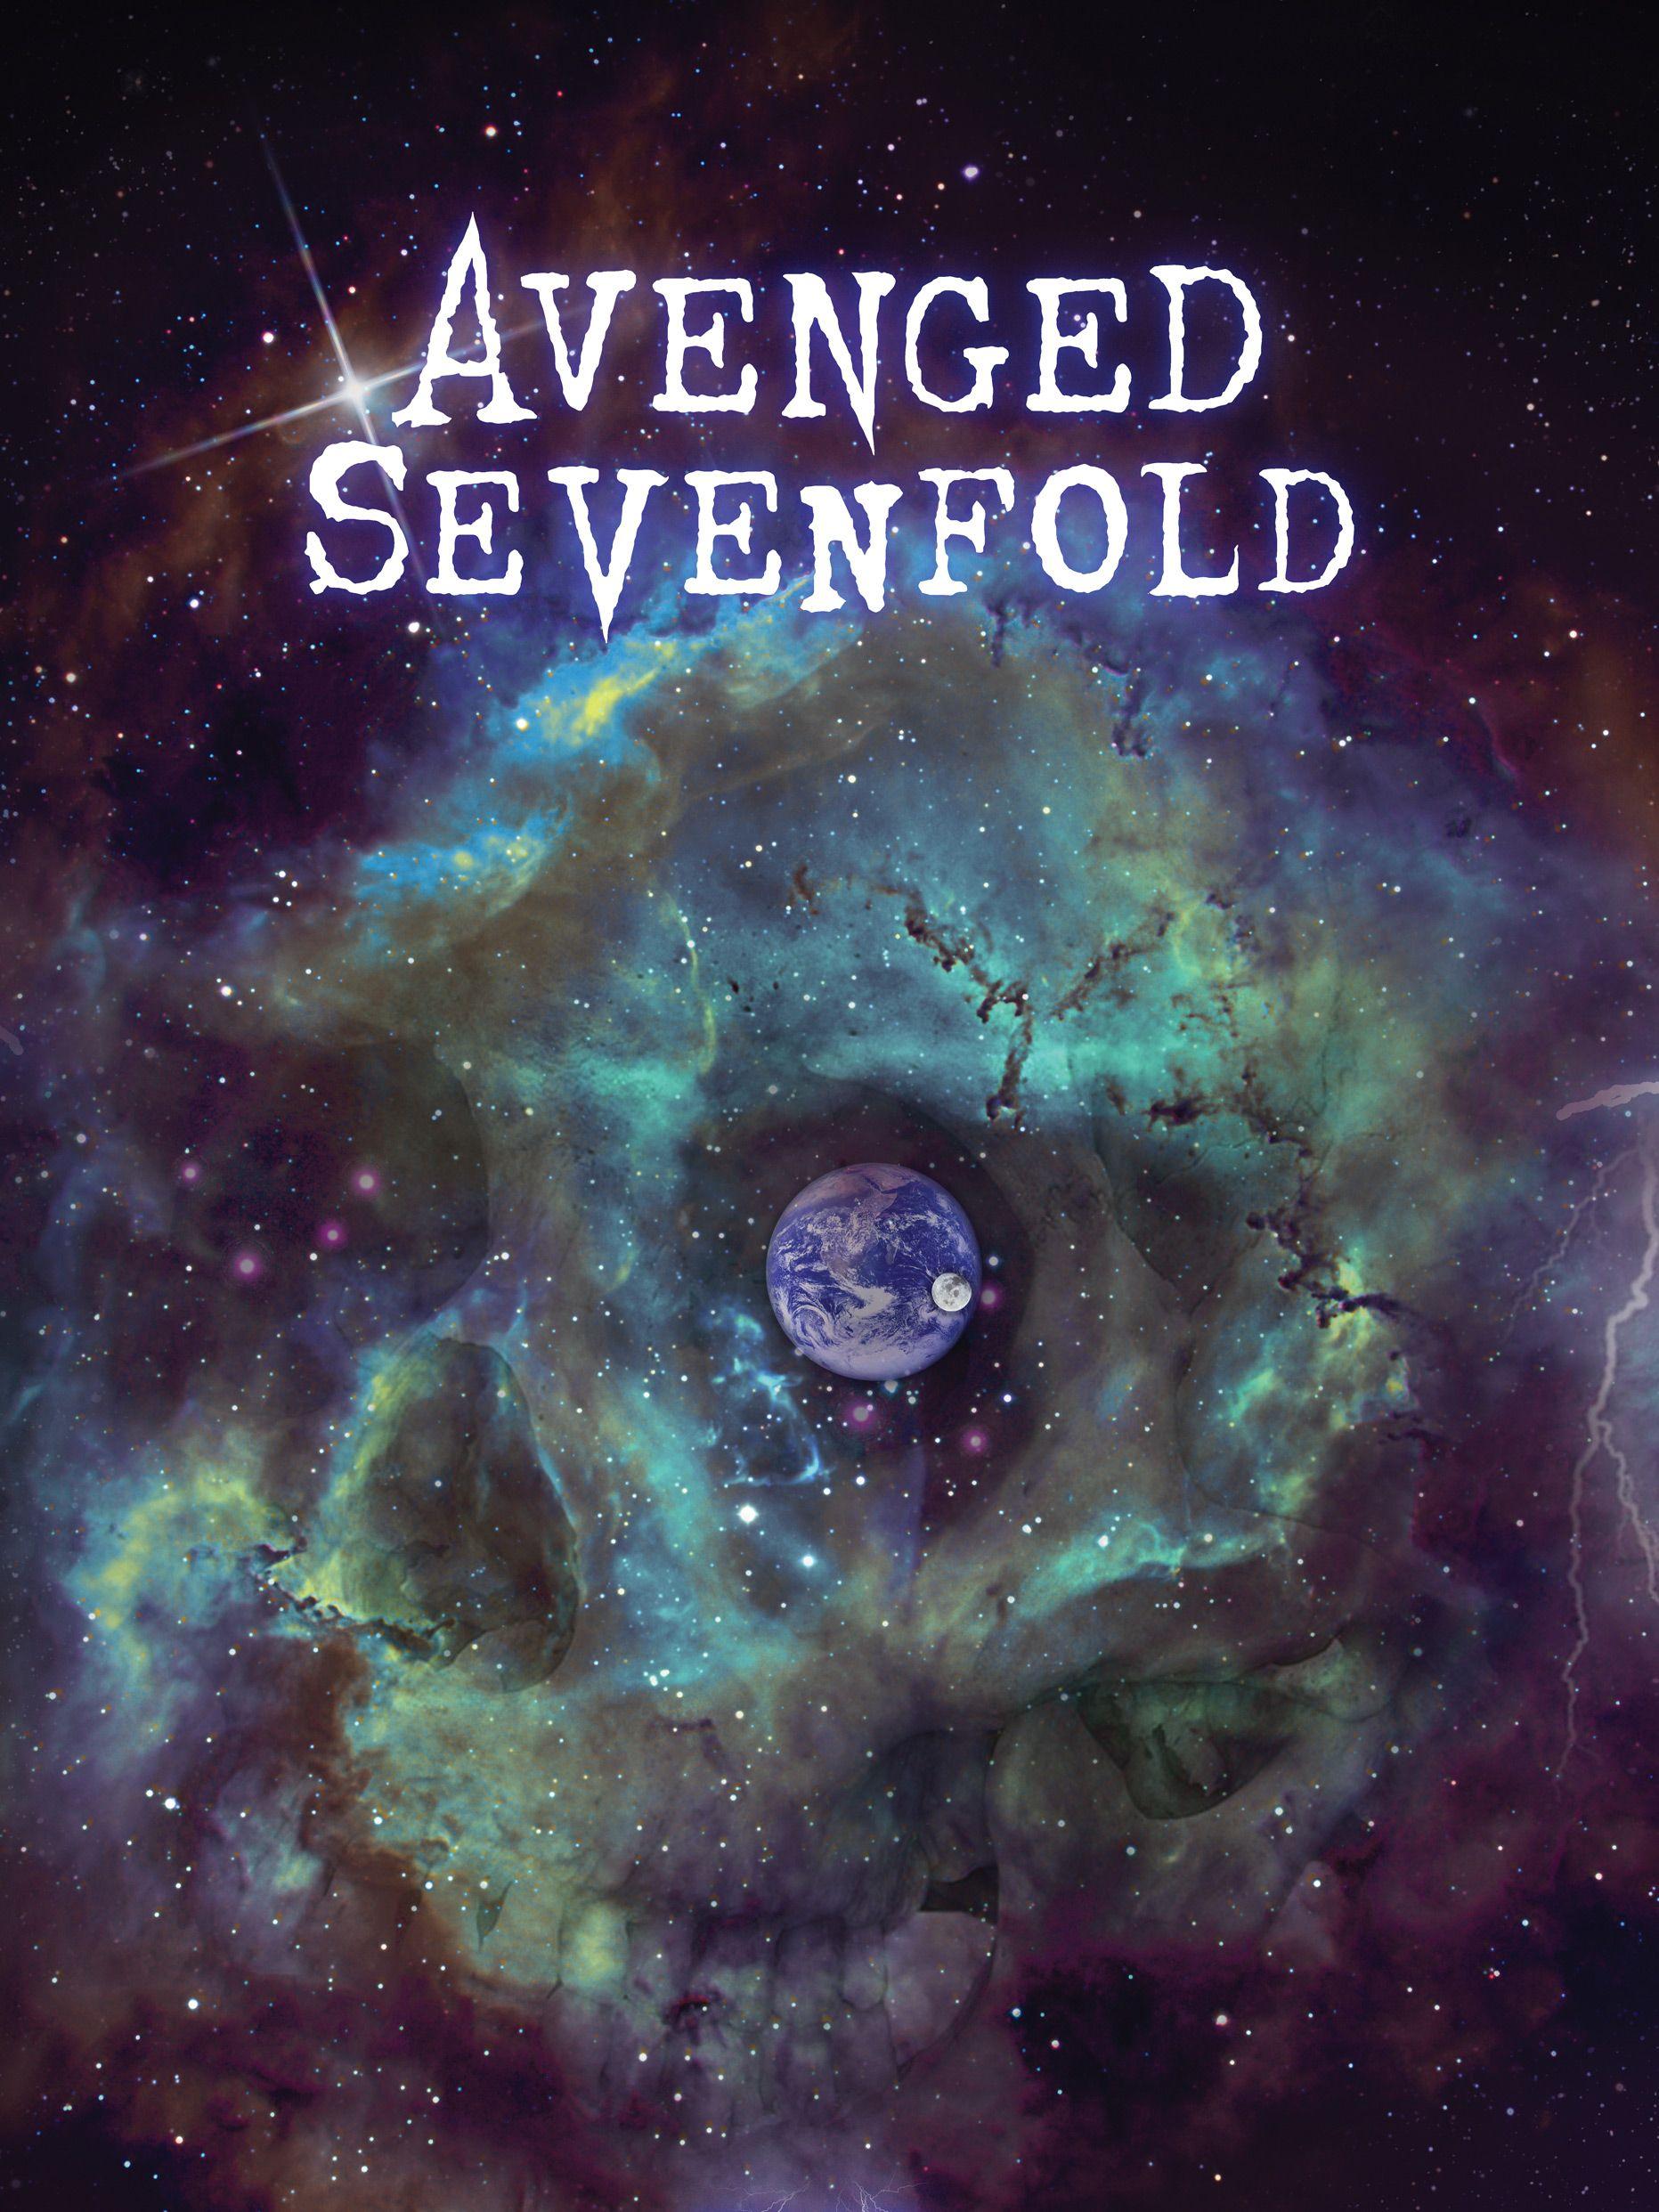 Avenged Sevenfold Iphone Wallpaper Avenged Sevenfold Wallpapers Avenged Sevenfold Avenged Sevenfold Stuff